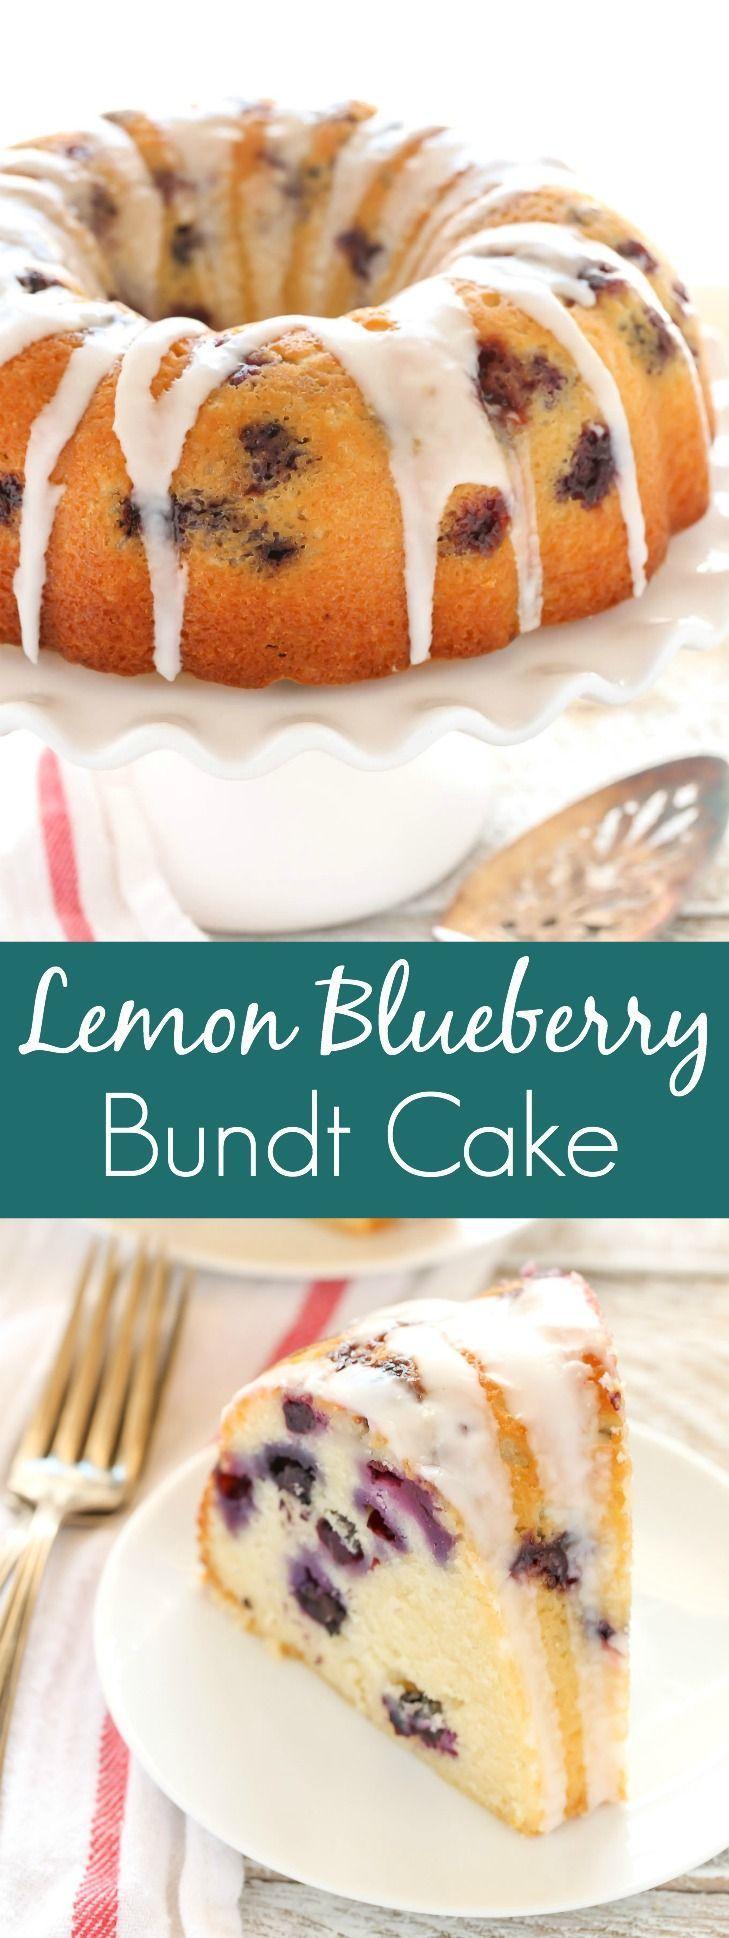 A moist lemon bundt cake filled with fresh blueberries and